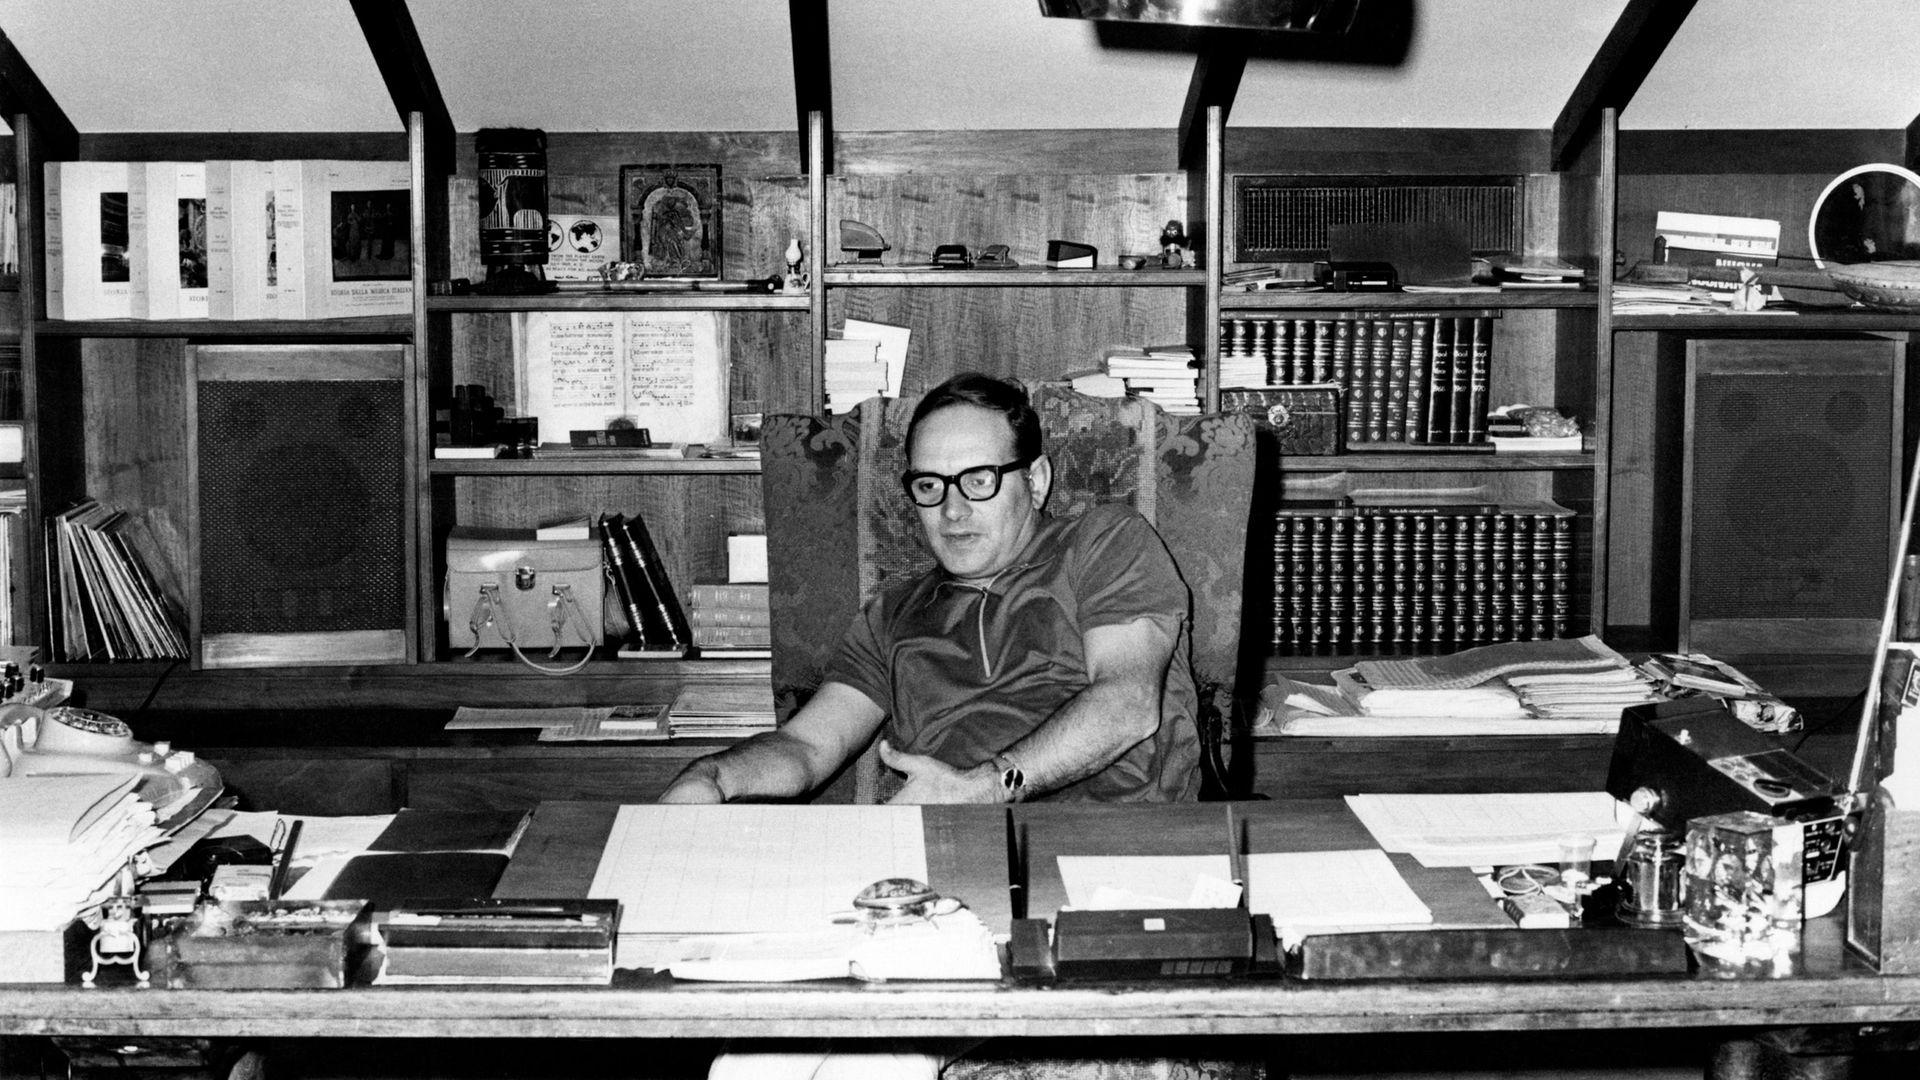 Ennio Morricone in his office in Rome in the 1970s - Credit: Mondadori via Getty Images